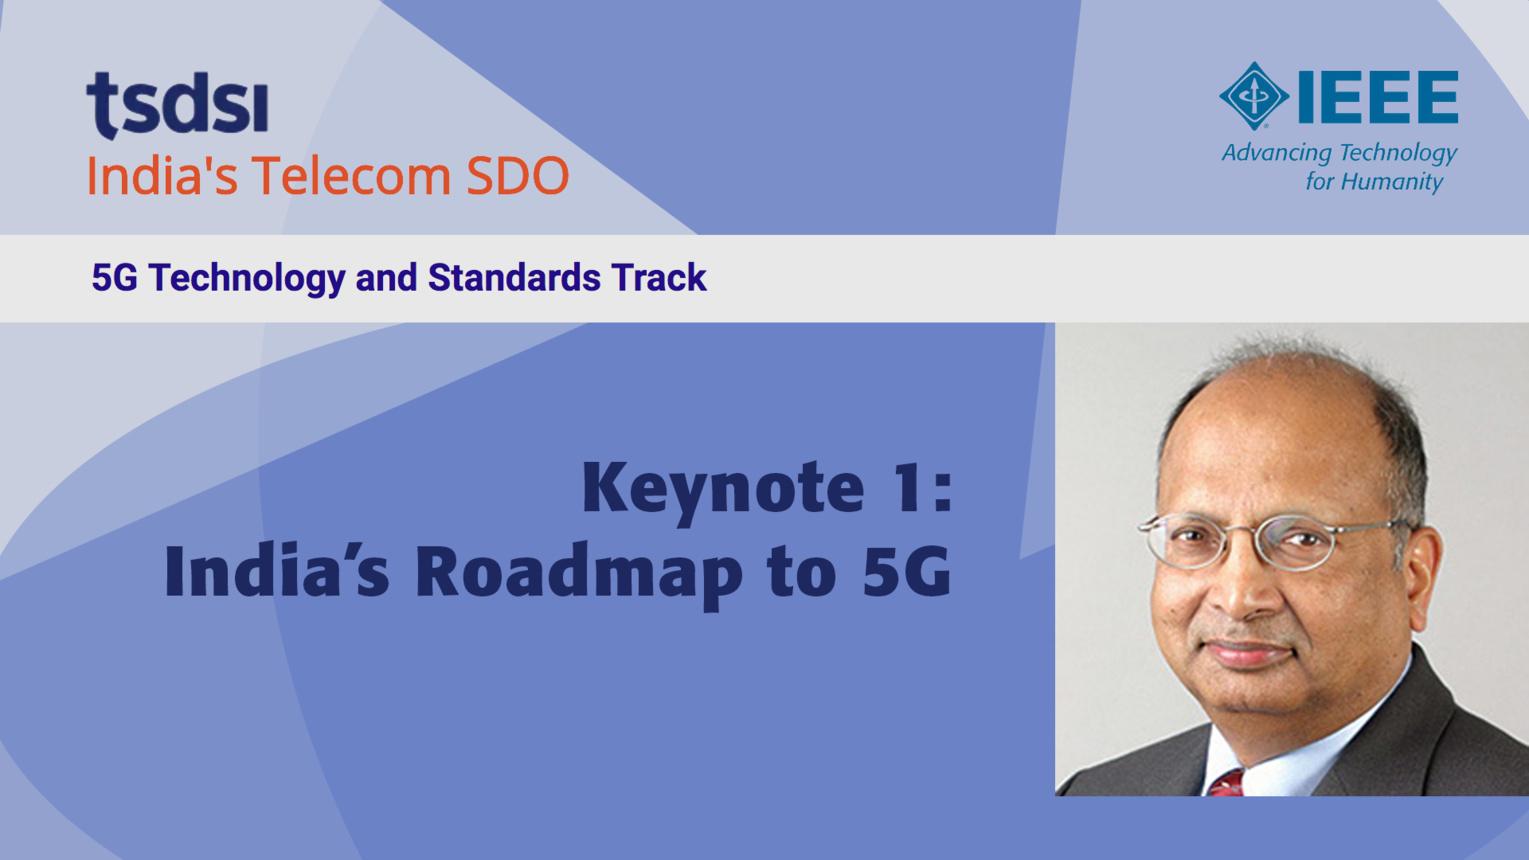 Keynote 1: India's Roadmap to 5G - Arogyaswami J. Paulraj - India Mobile Congress, 2018